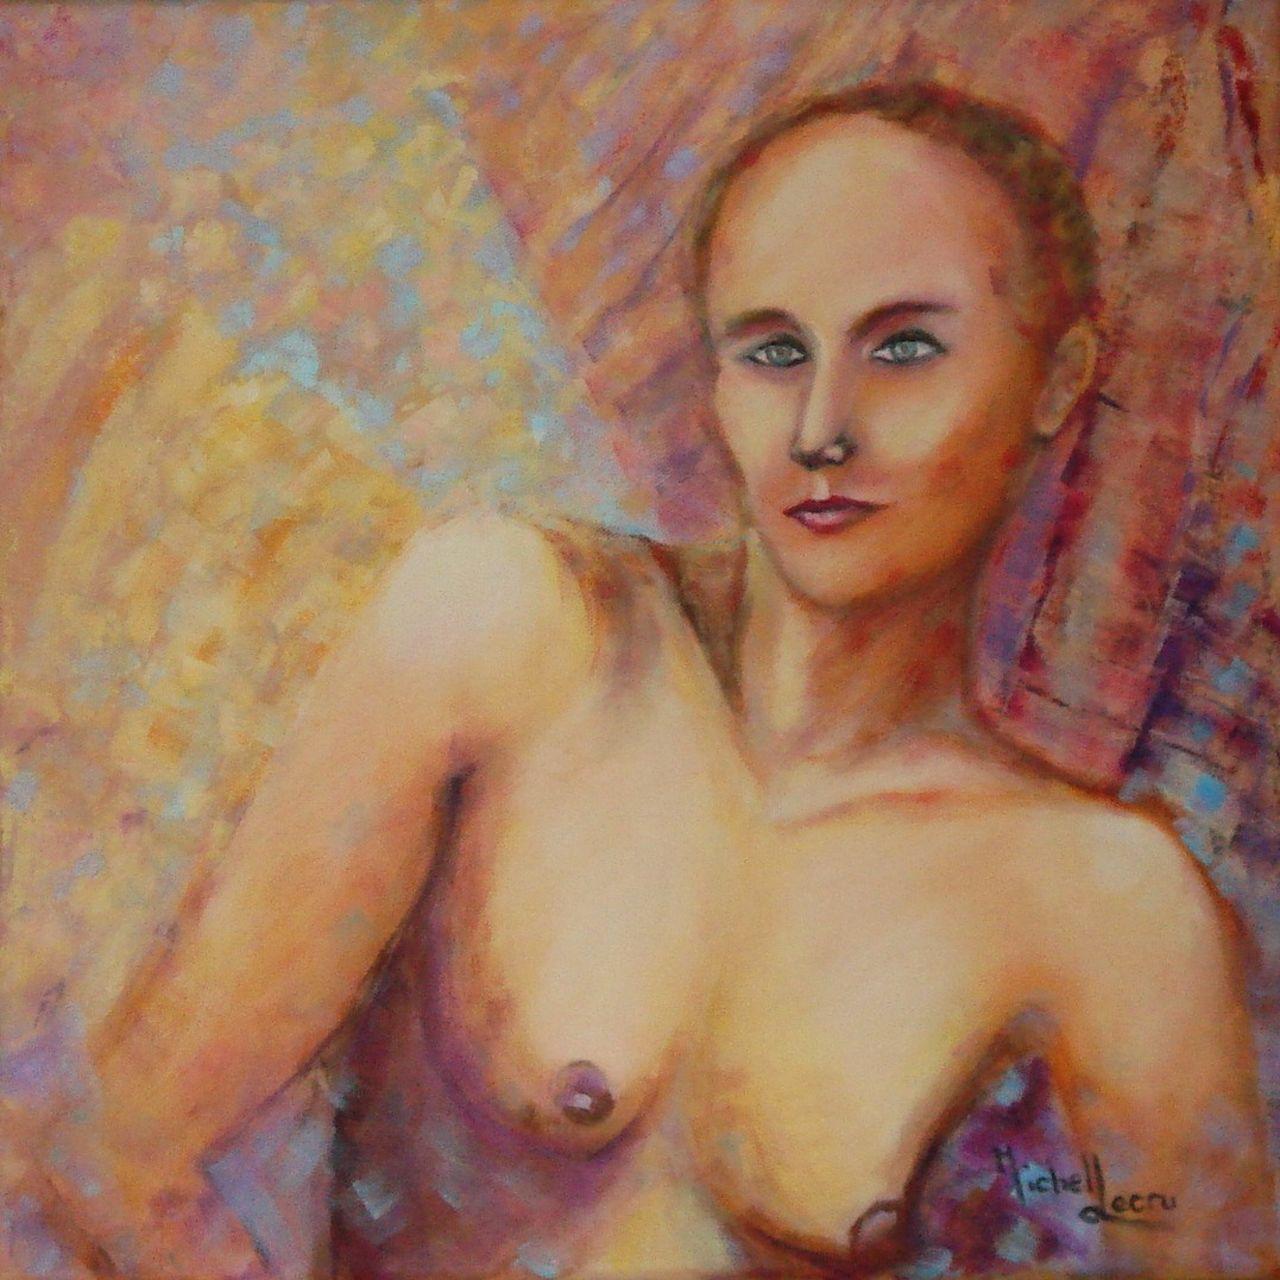 michel lecru portrait de Vanessa